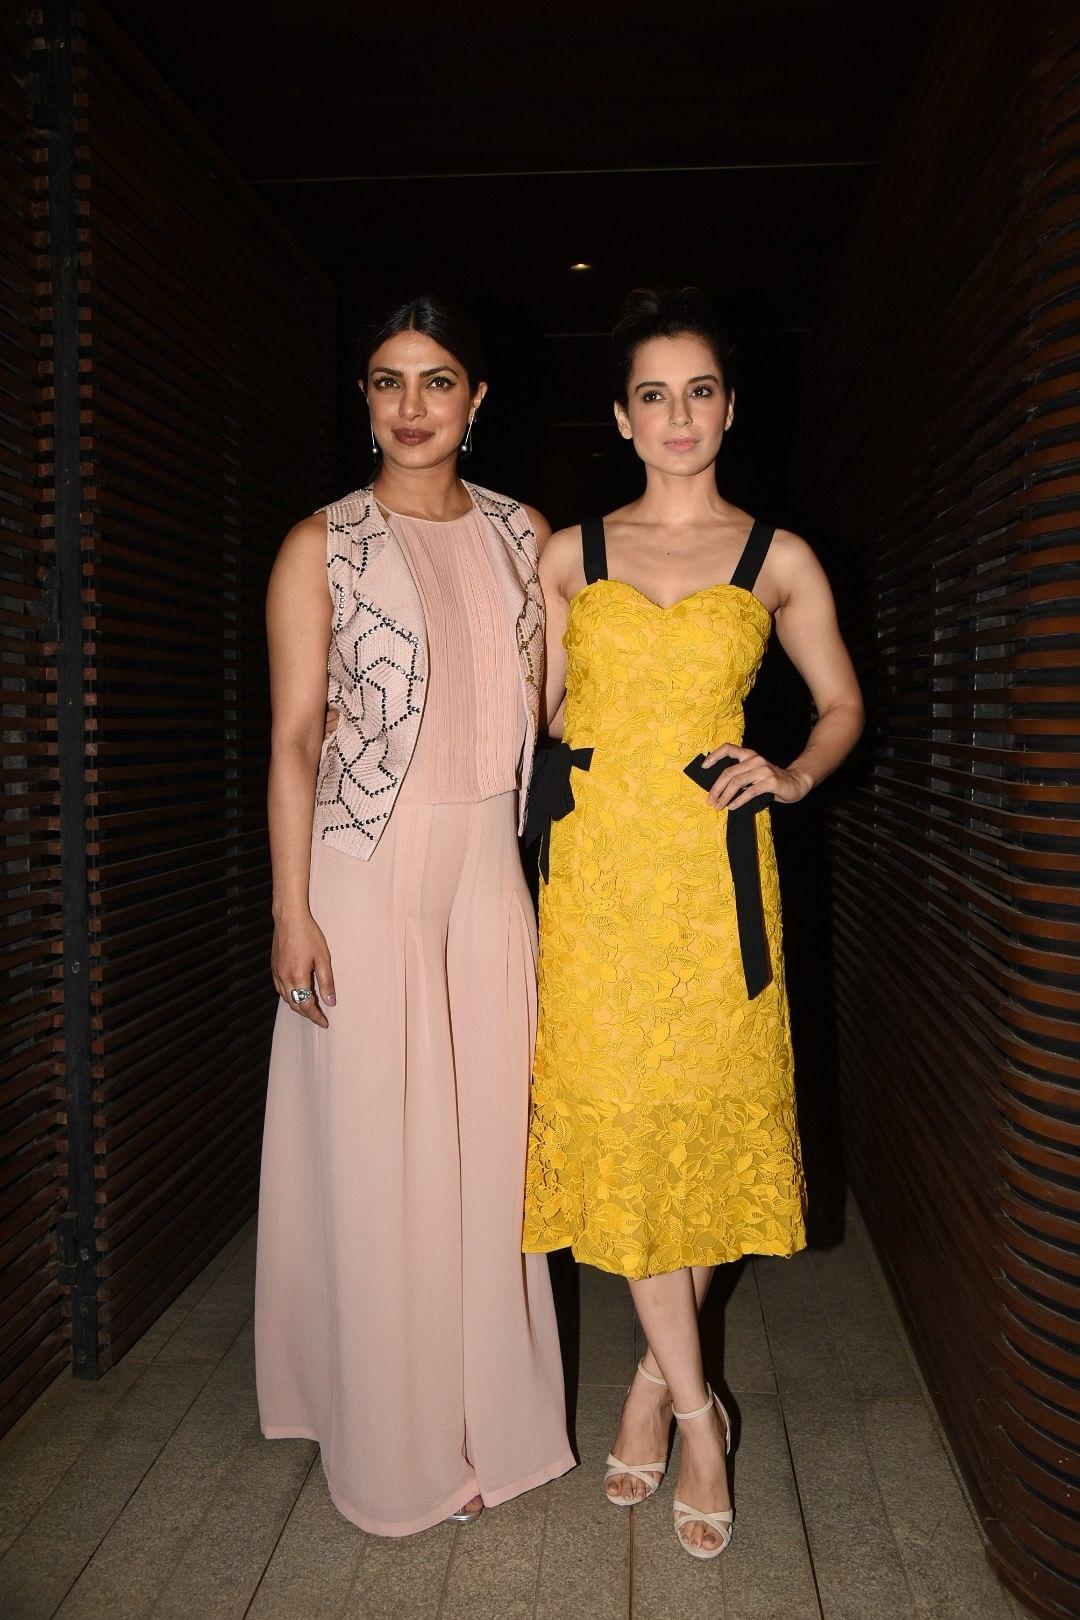 Priyanka and Kangana, standing tall together. (Photo: Yogen Shah)